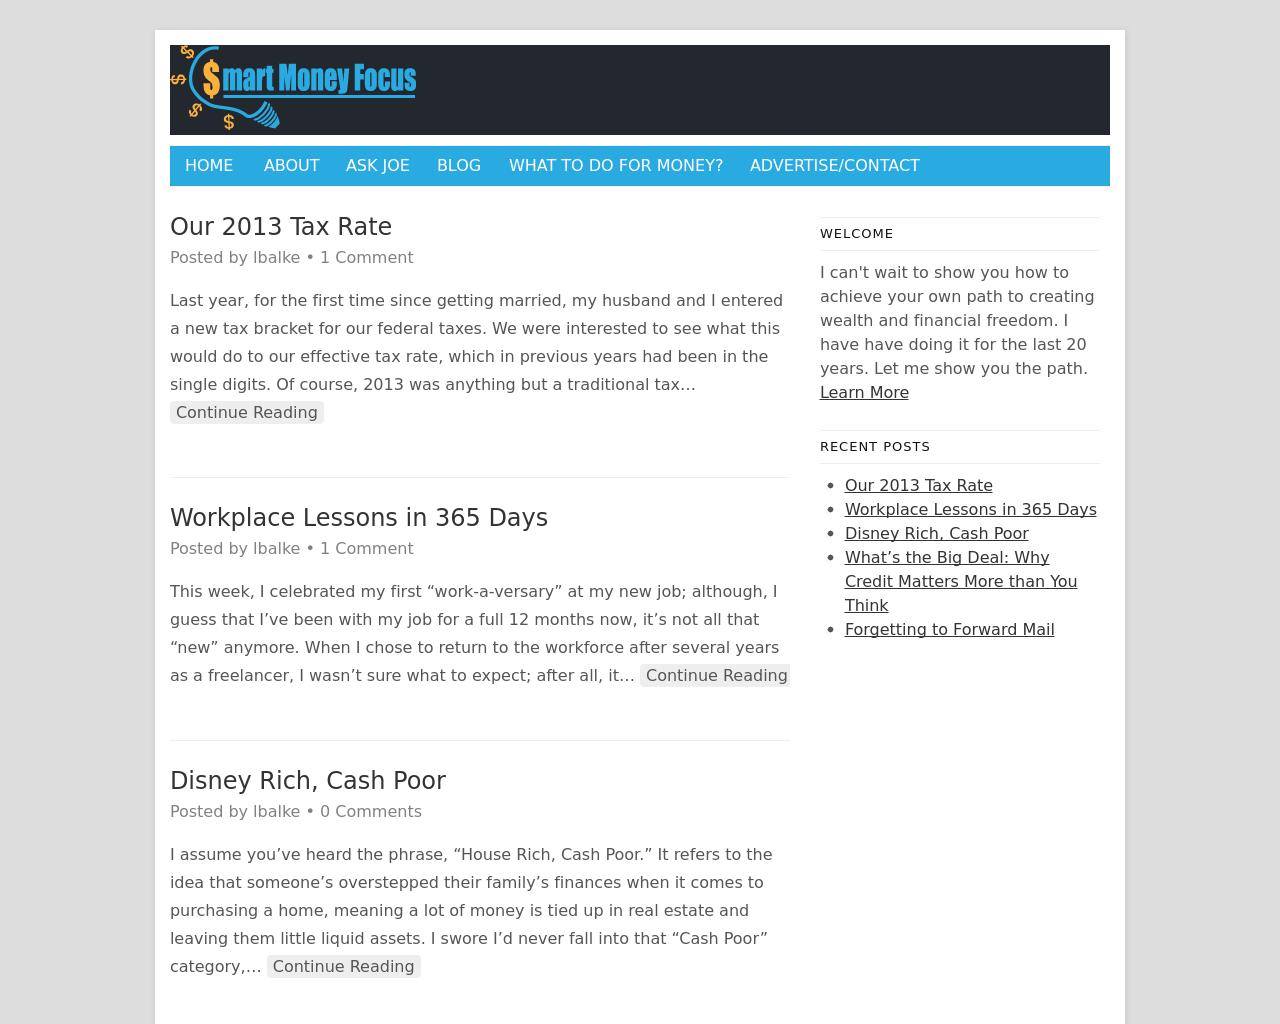 Smart-Money-Focus-Advertising-Reviews-Pricing